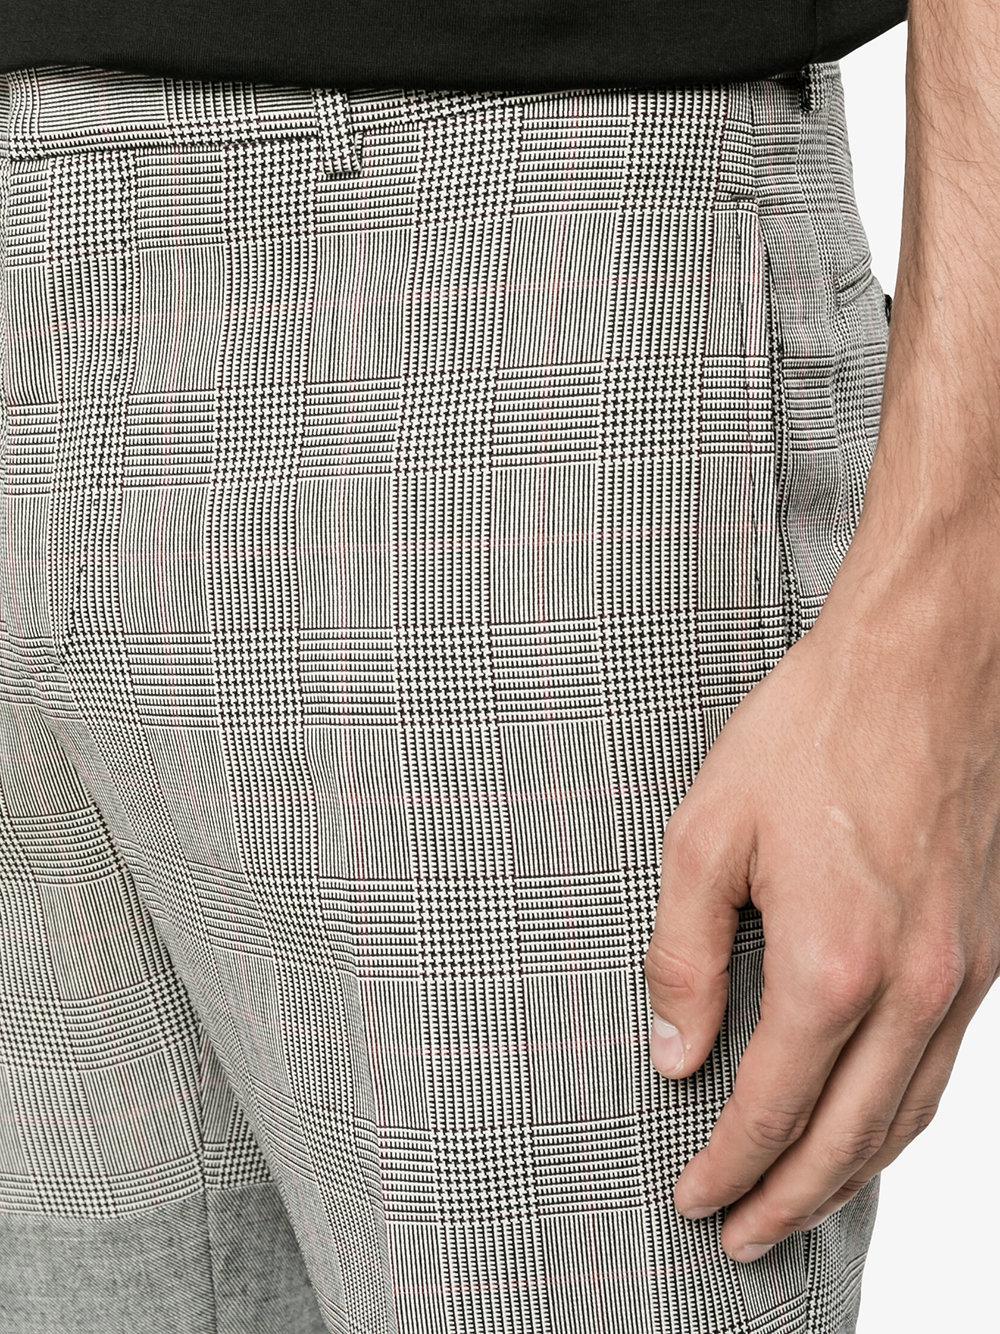 Alexander McQueen Wool Herringbone And Houndstooth Cigar Trousers in Black for Men